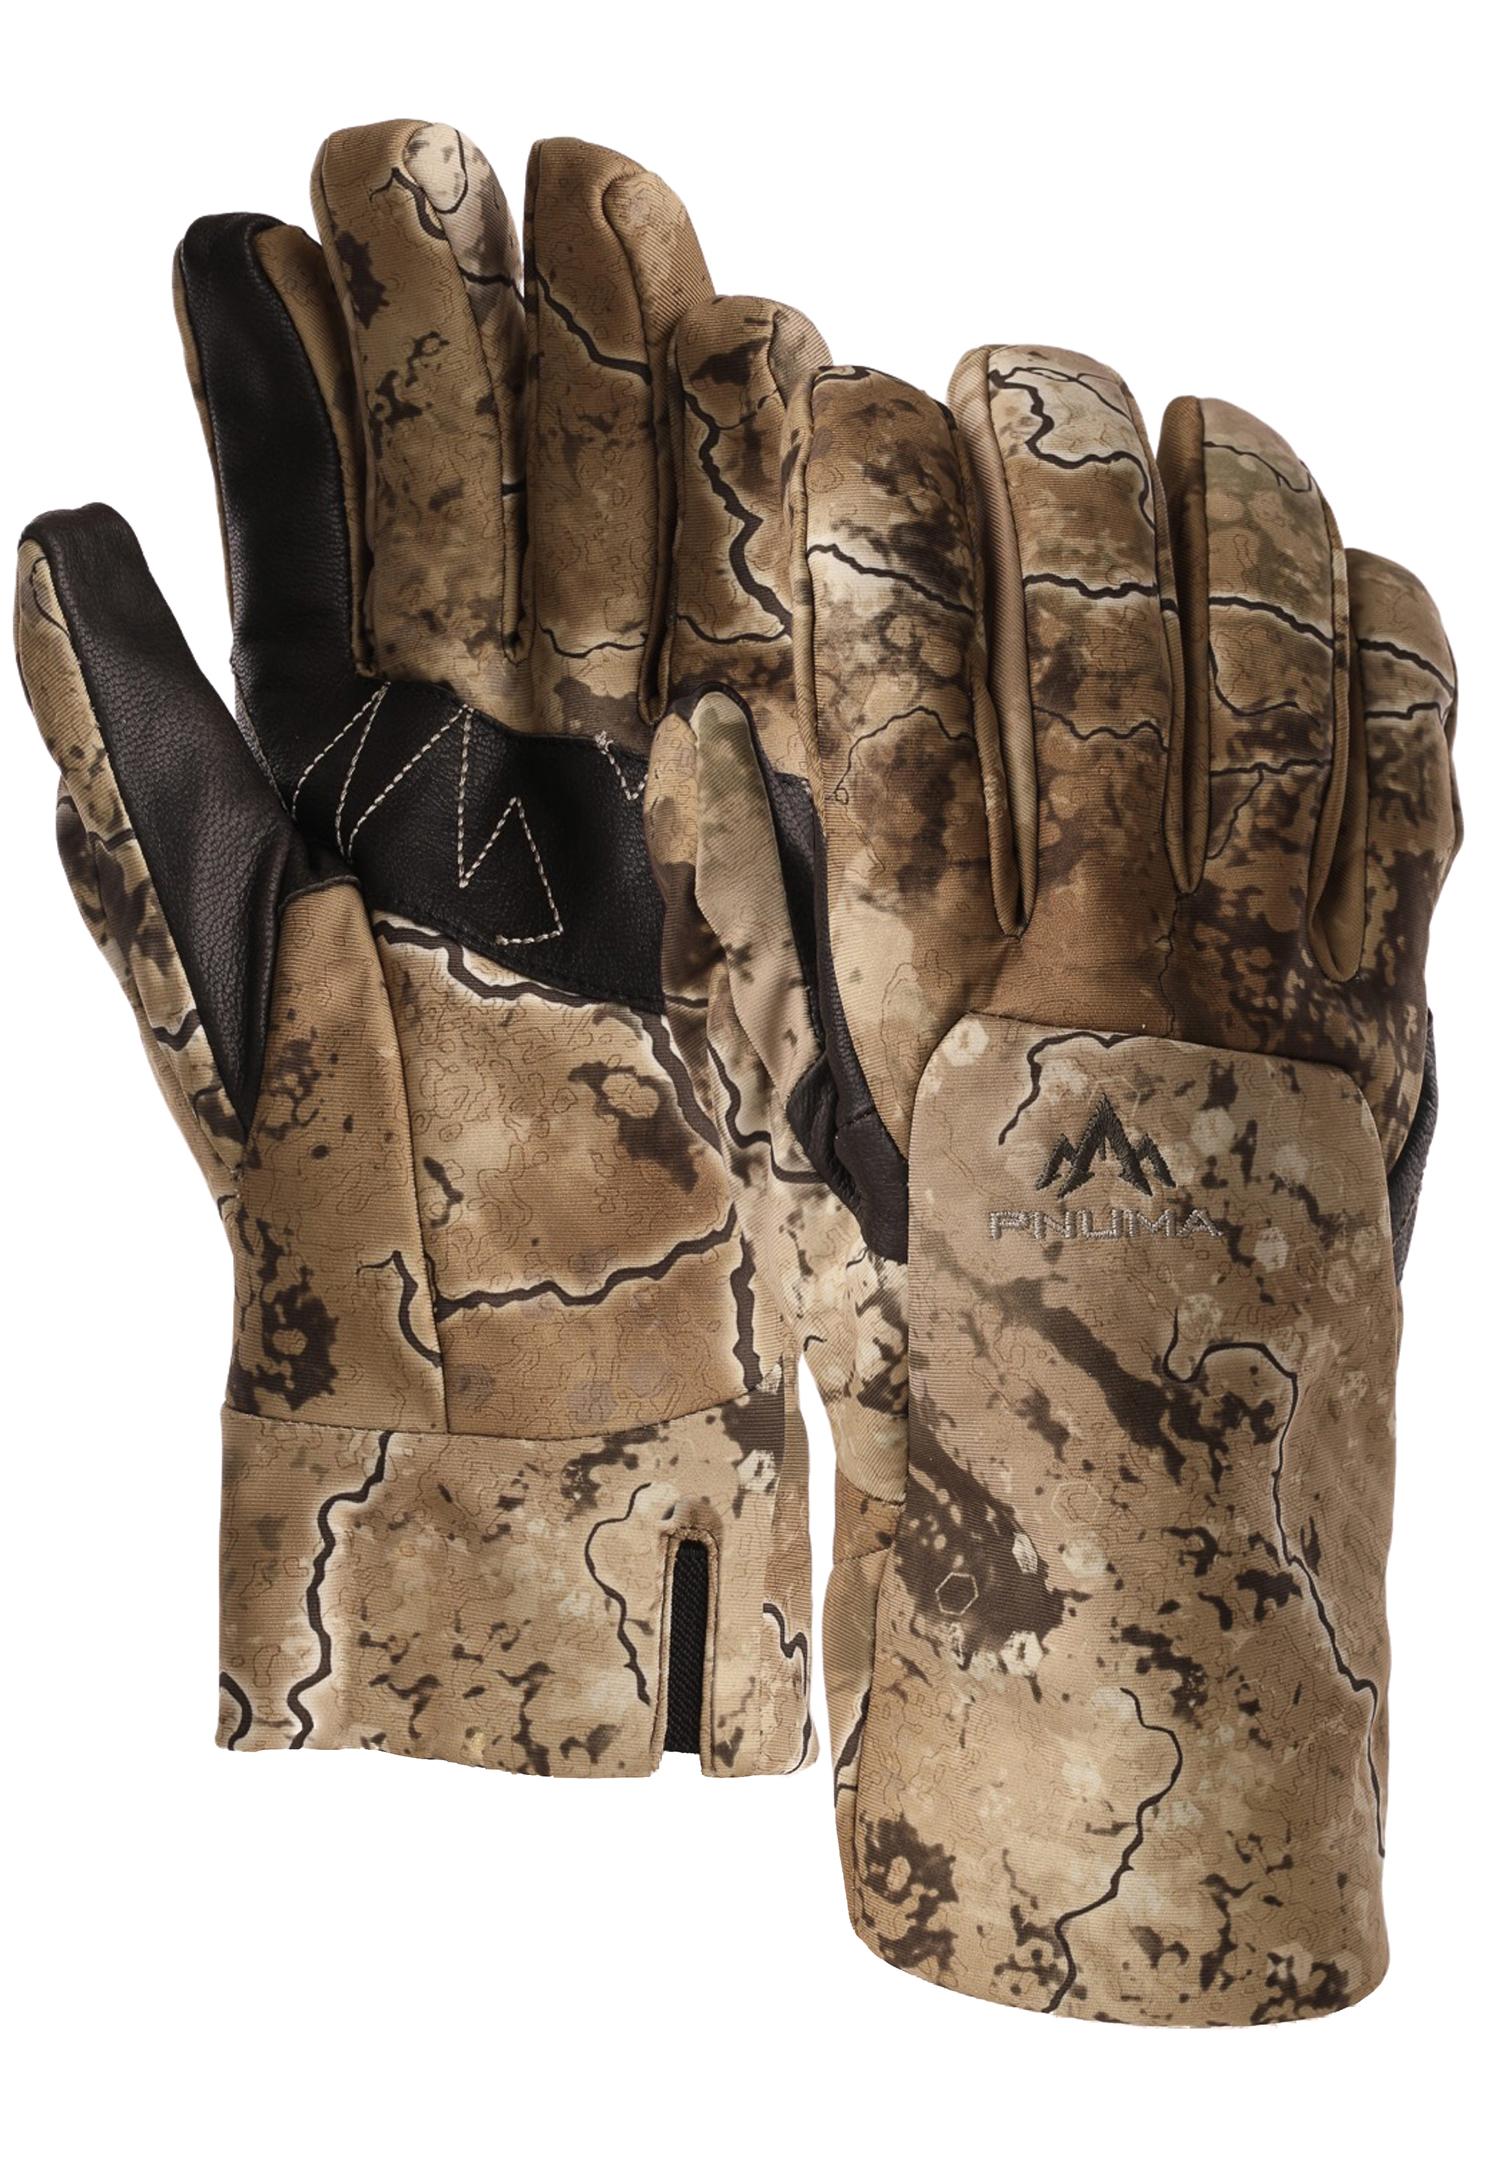 Selkirk Glove